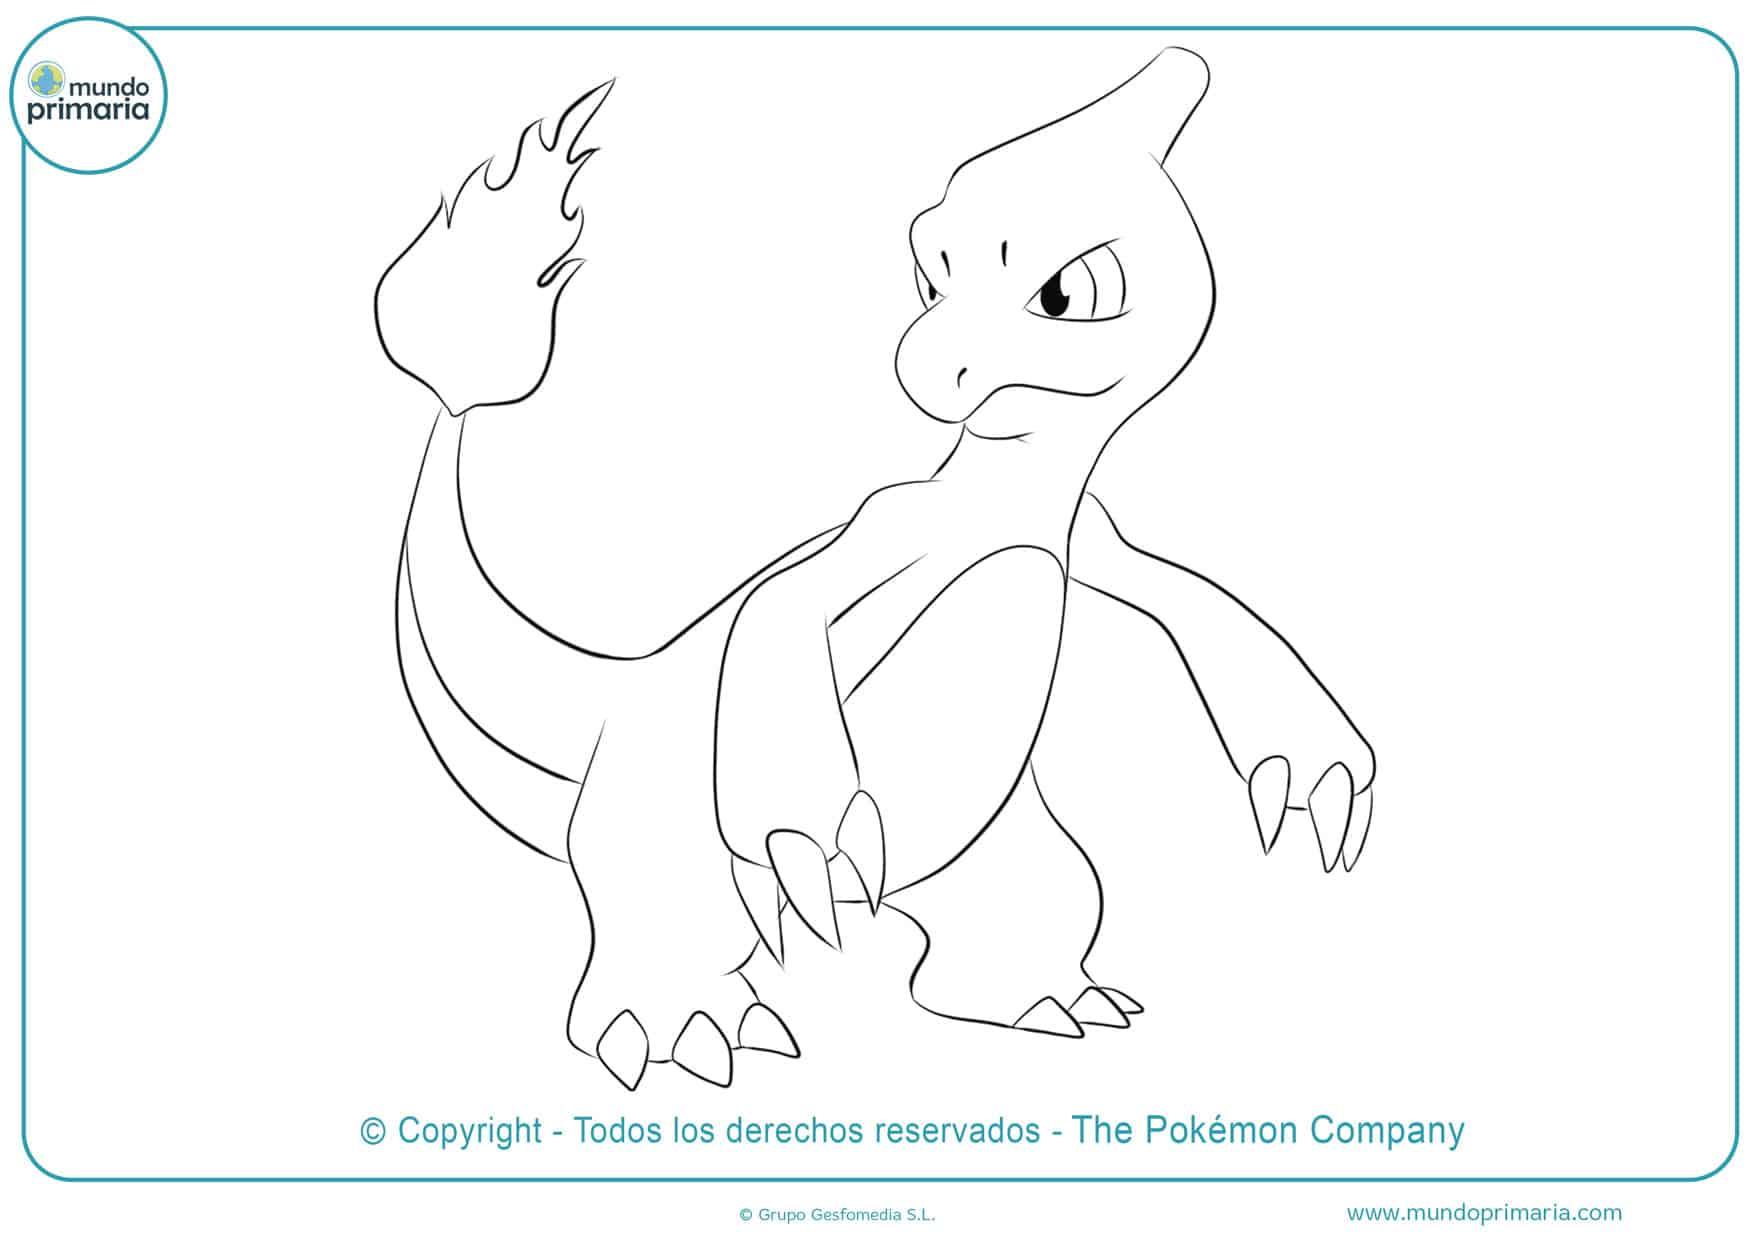 Dibujos De Pokémon Para Colorearfáciles De Imprimir